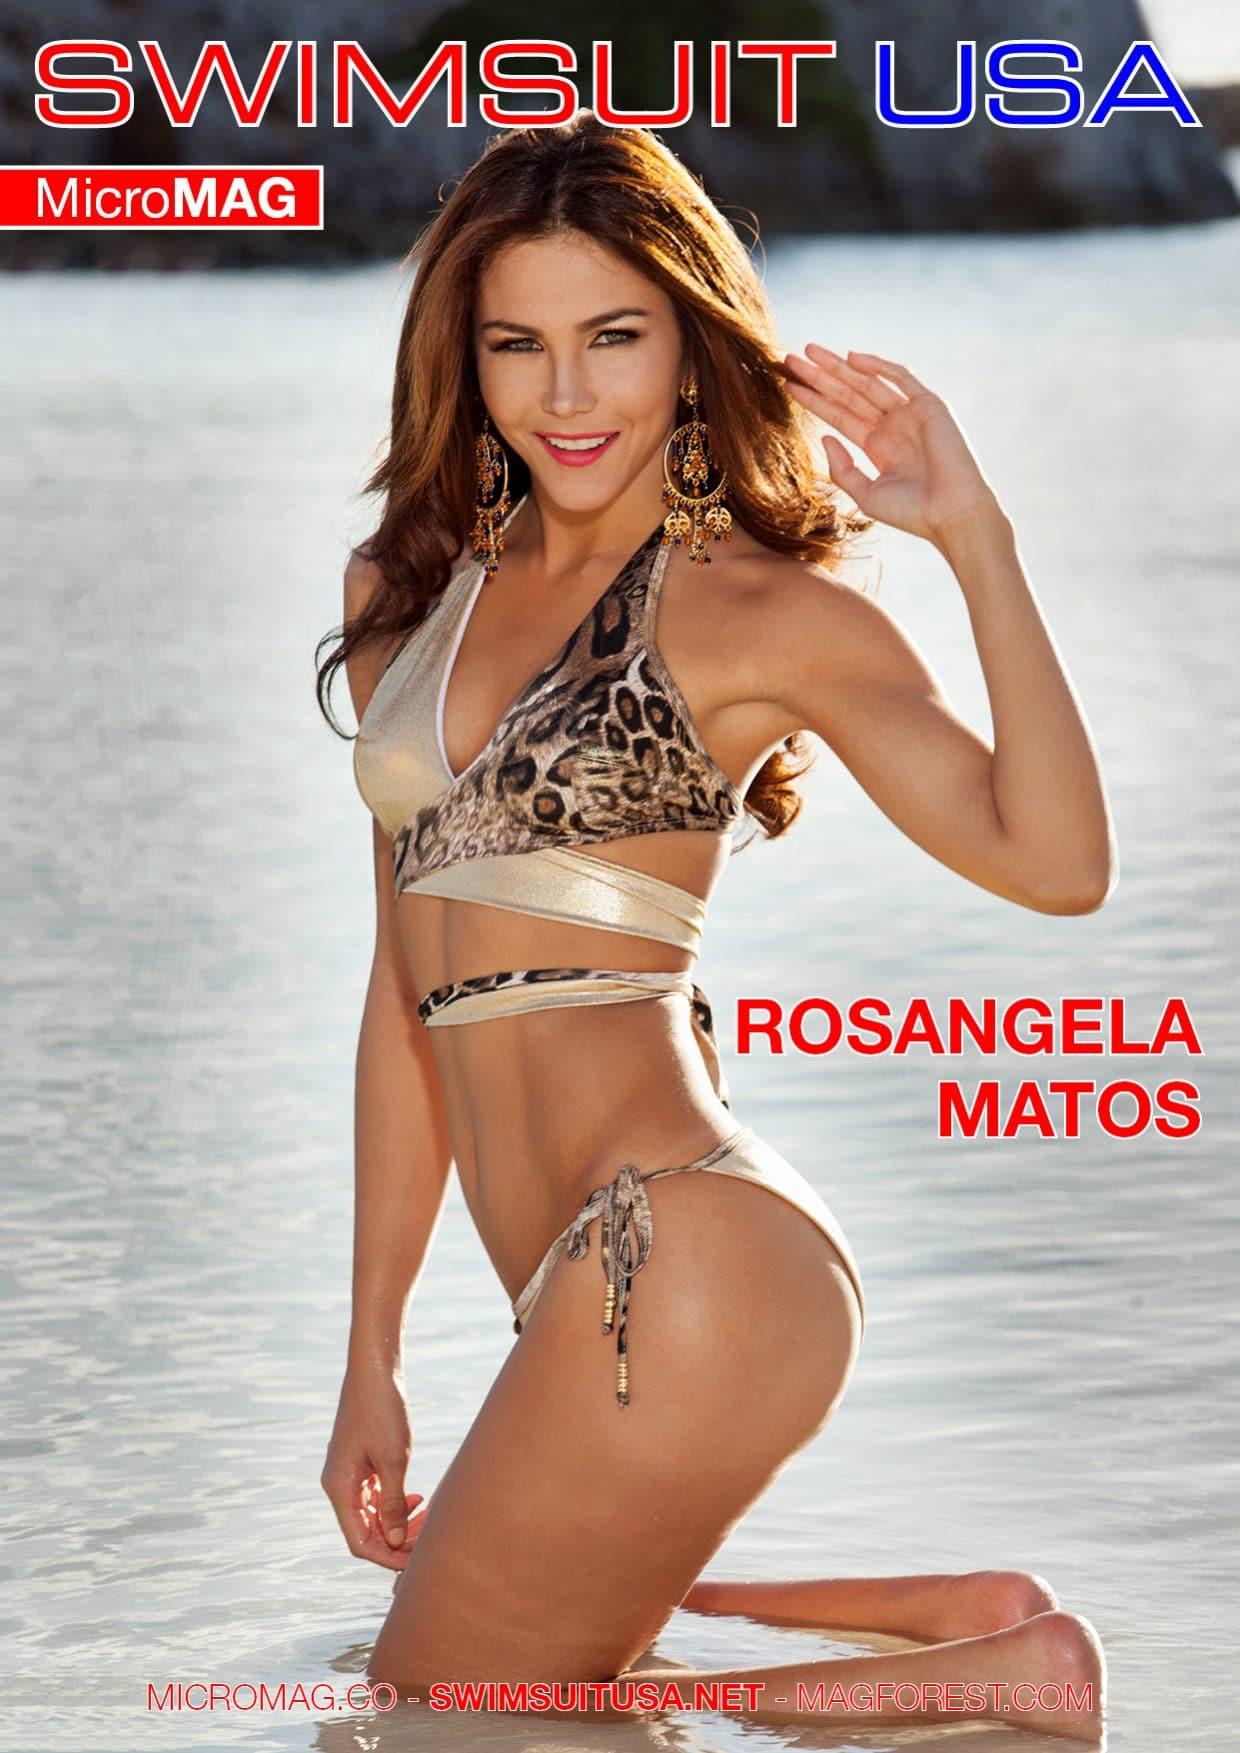 Swimsuit Usa Micromag – Rosangela Matos – Issue 2